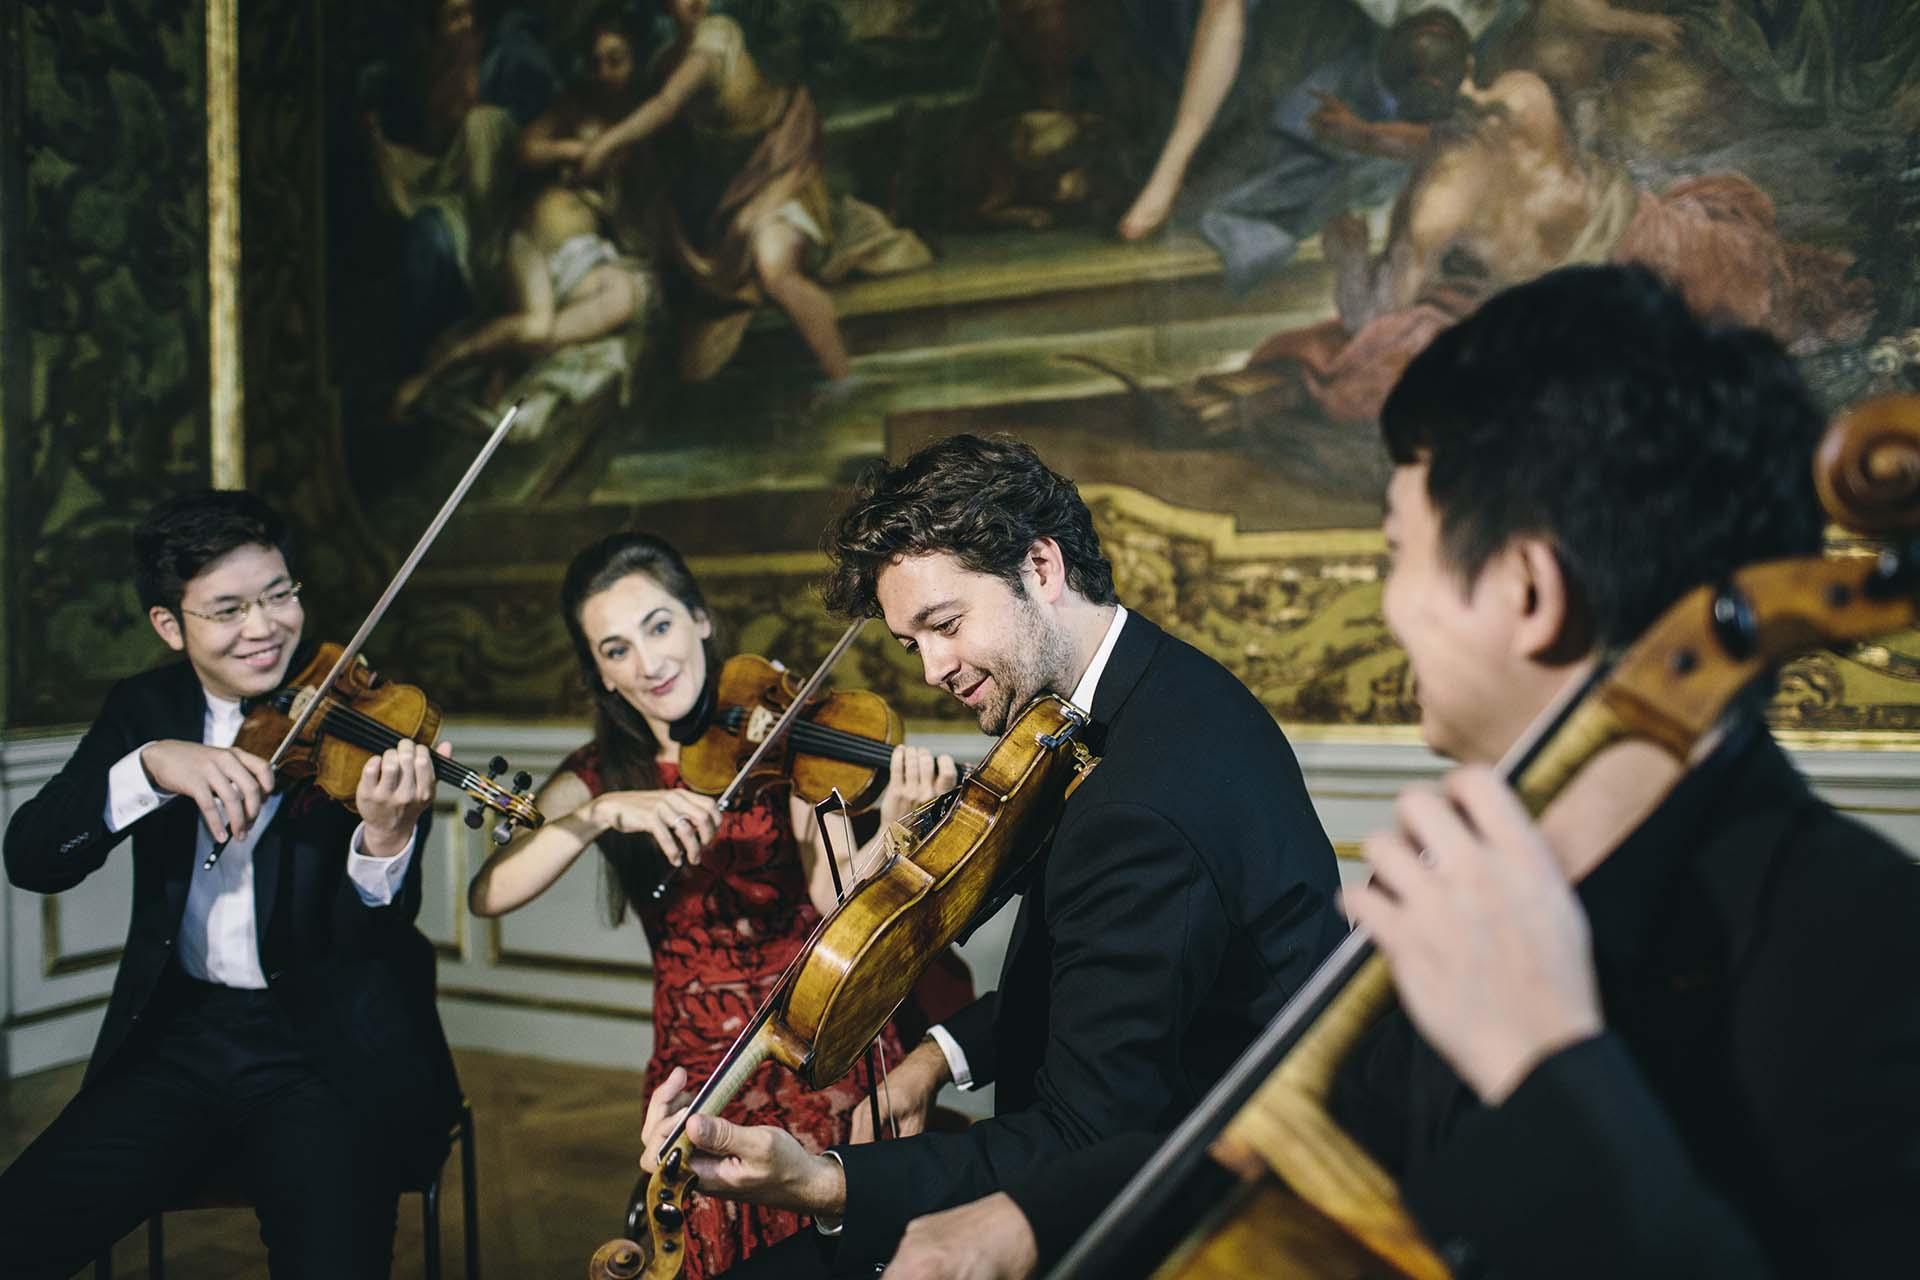 Musikfestspiele Moritzburg Dresden quartett